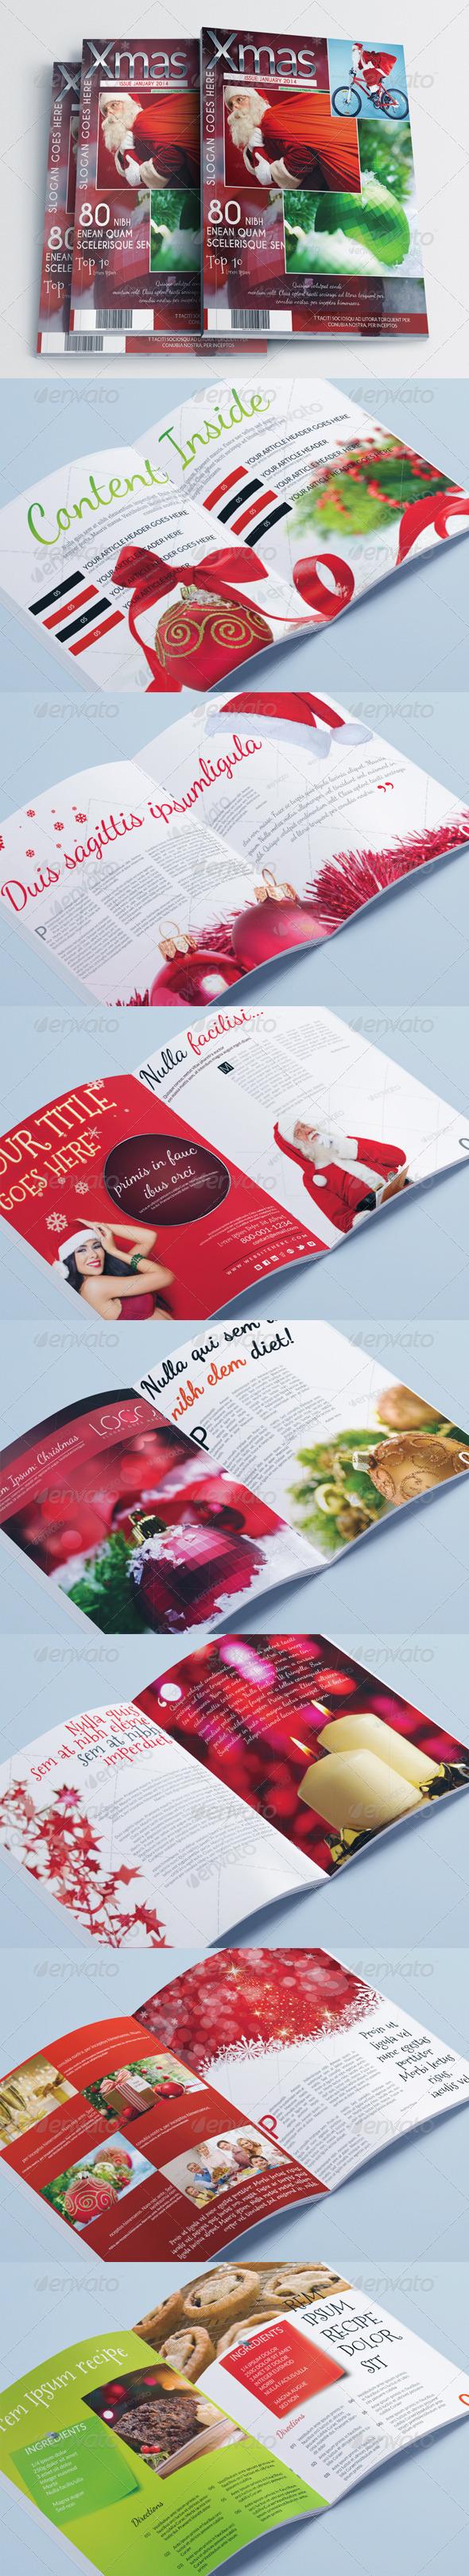 GraphicRiver Magazine Template Christmas Edition 6171546